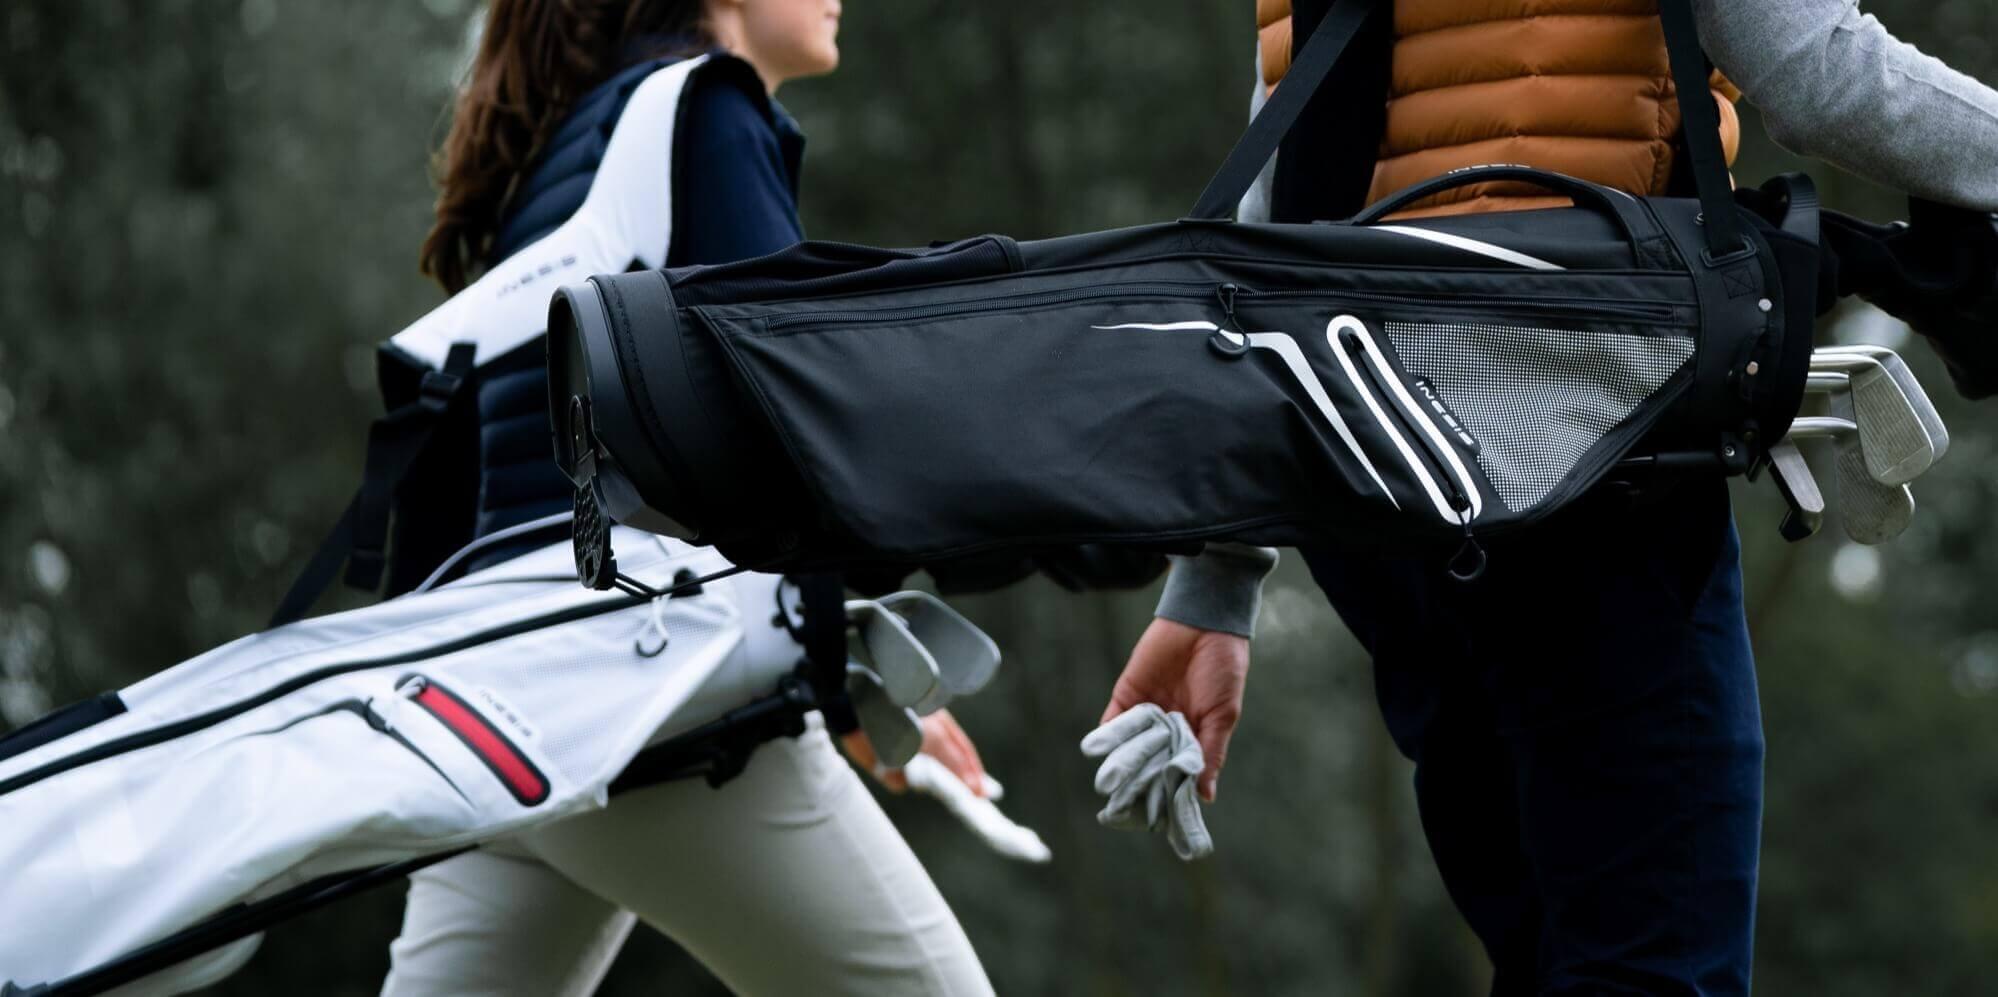 What Kit Do I Need to Start Golfing?